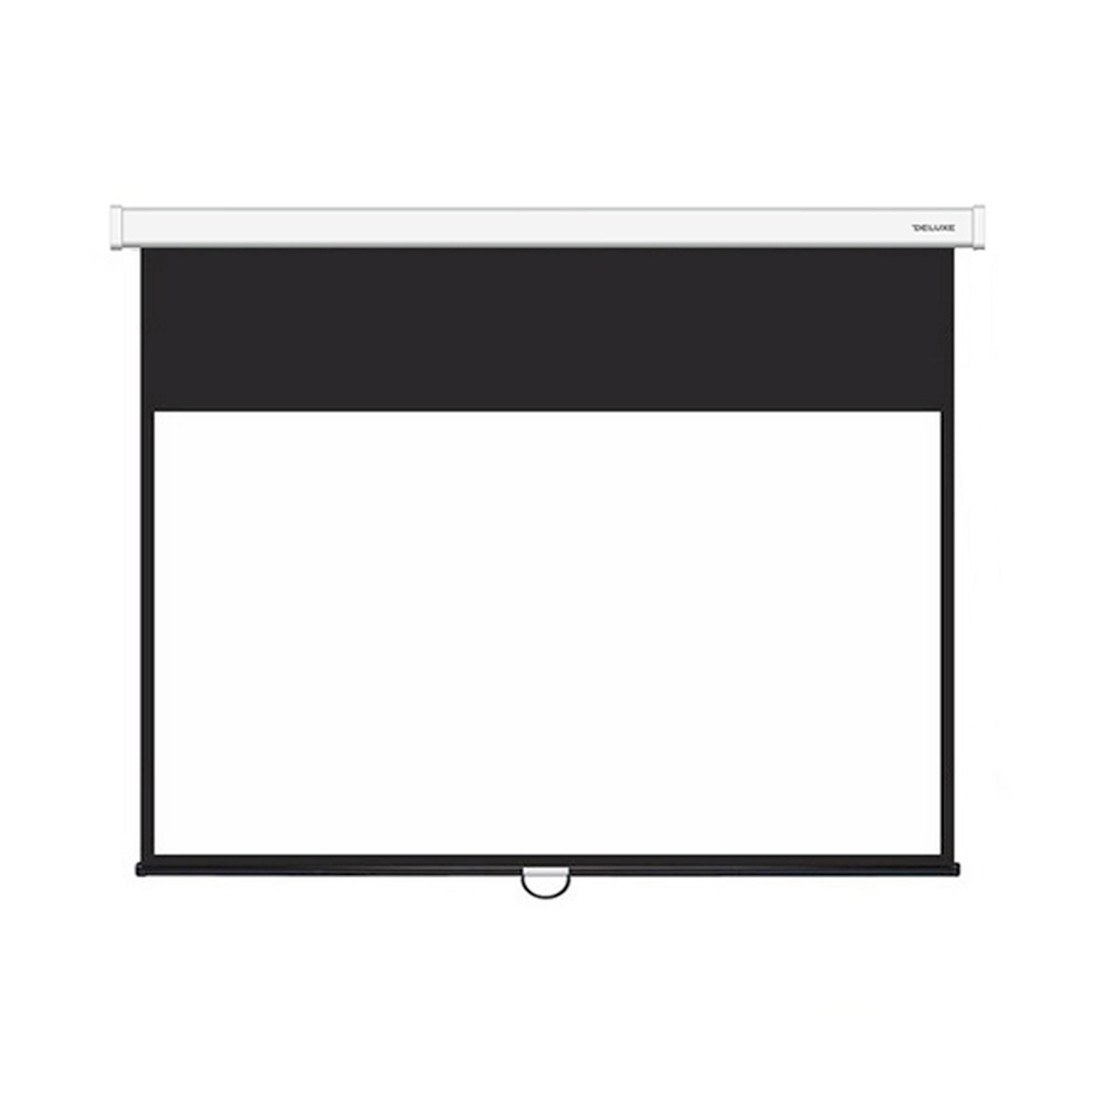 "Экран Deluxe DLS-M305Wx (120""х120""), Ø - 170"", Раб. поверхность 297х297 см., 1:1"